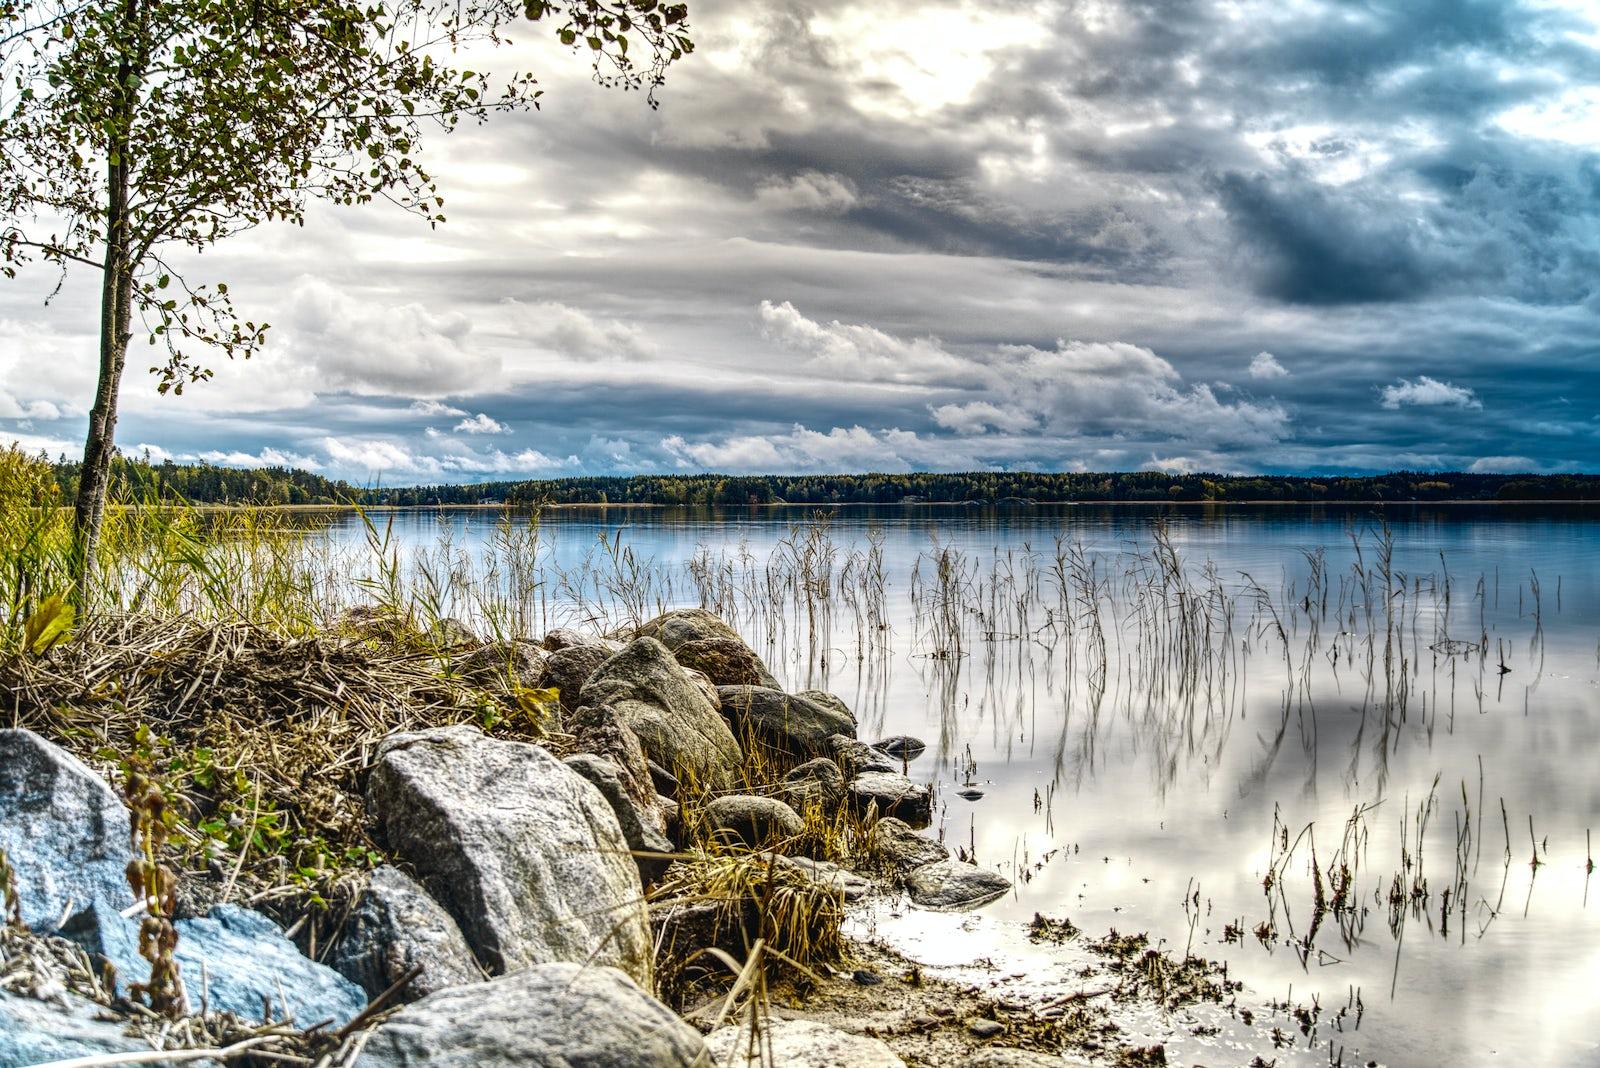 © istock/Ilja_Enger-Tsizikov